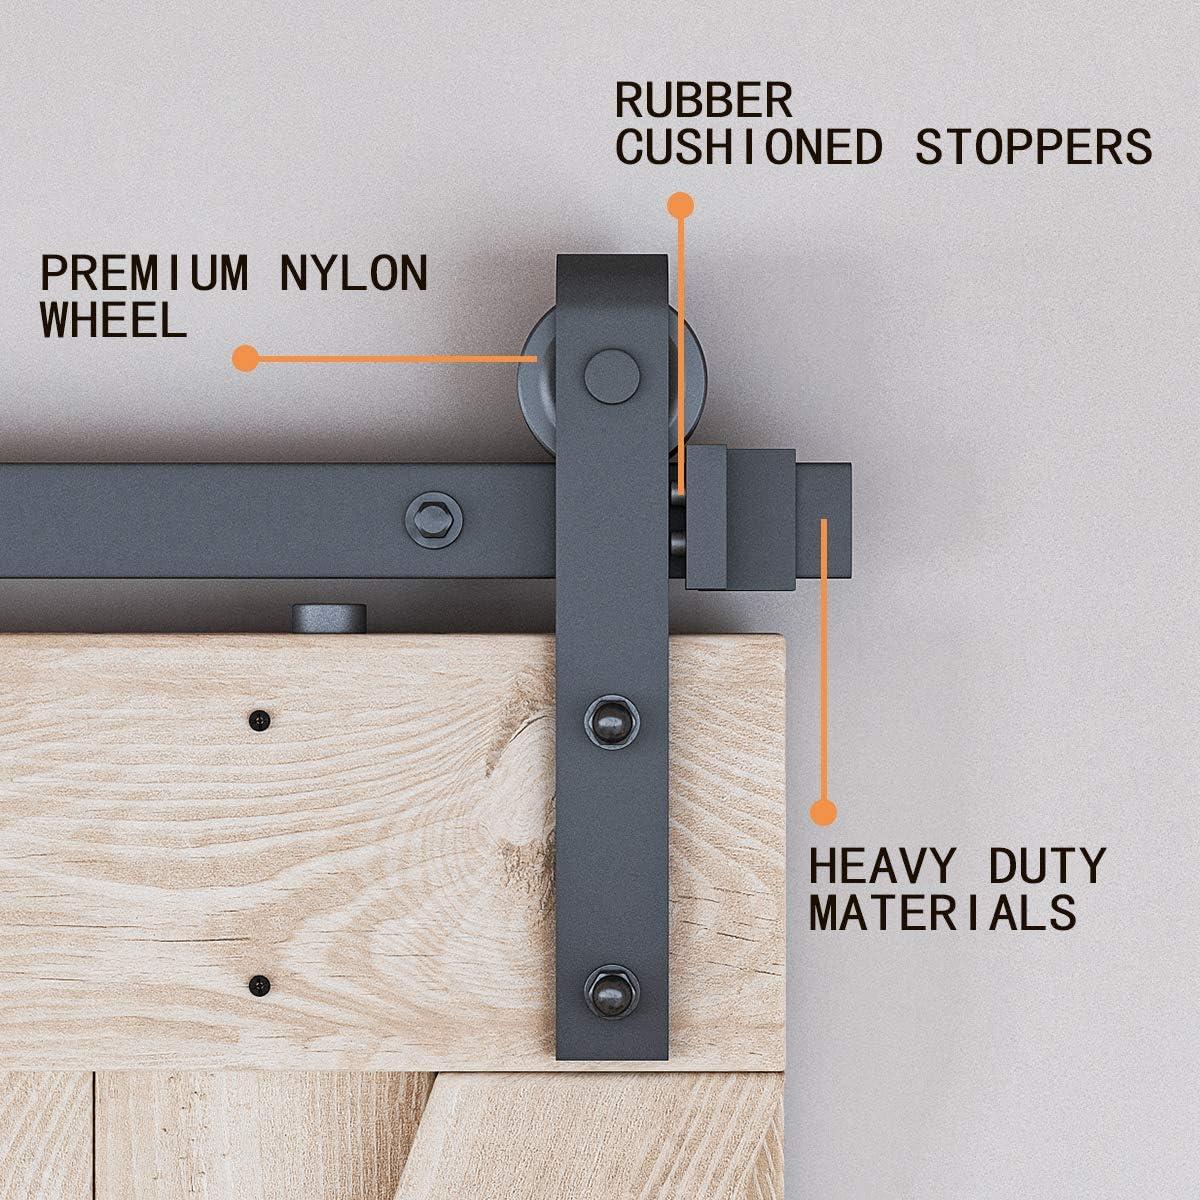 Fit 1 3//8-1 3//4 Thickness J-Shape Upgraded Nylon Hanger Living Room Black Easy to Install 30 Wide Door Panel Bathroom Perfect for Kitchen LDB/_Homer 6 Foot Sliding Barn Door Hardware Kit